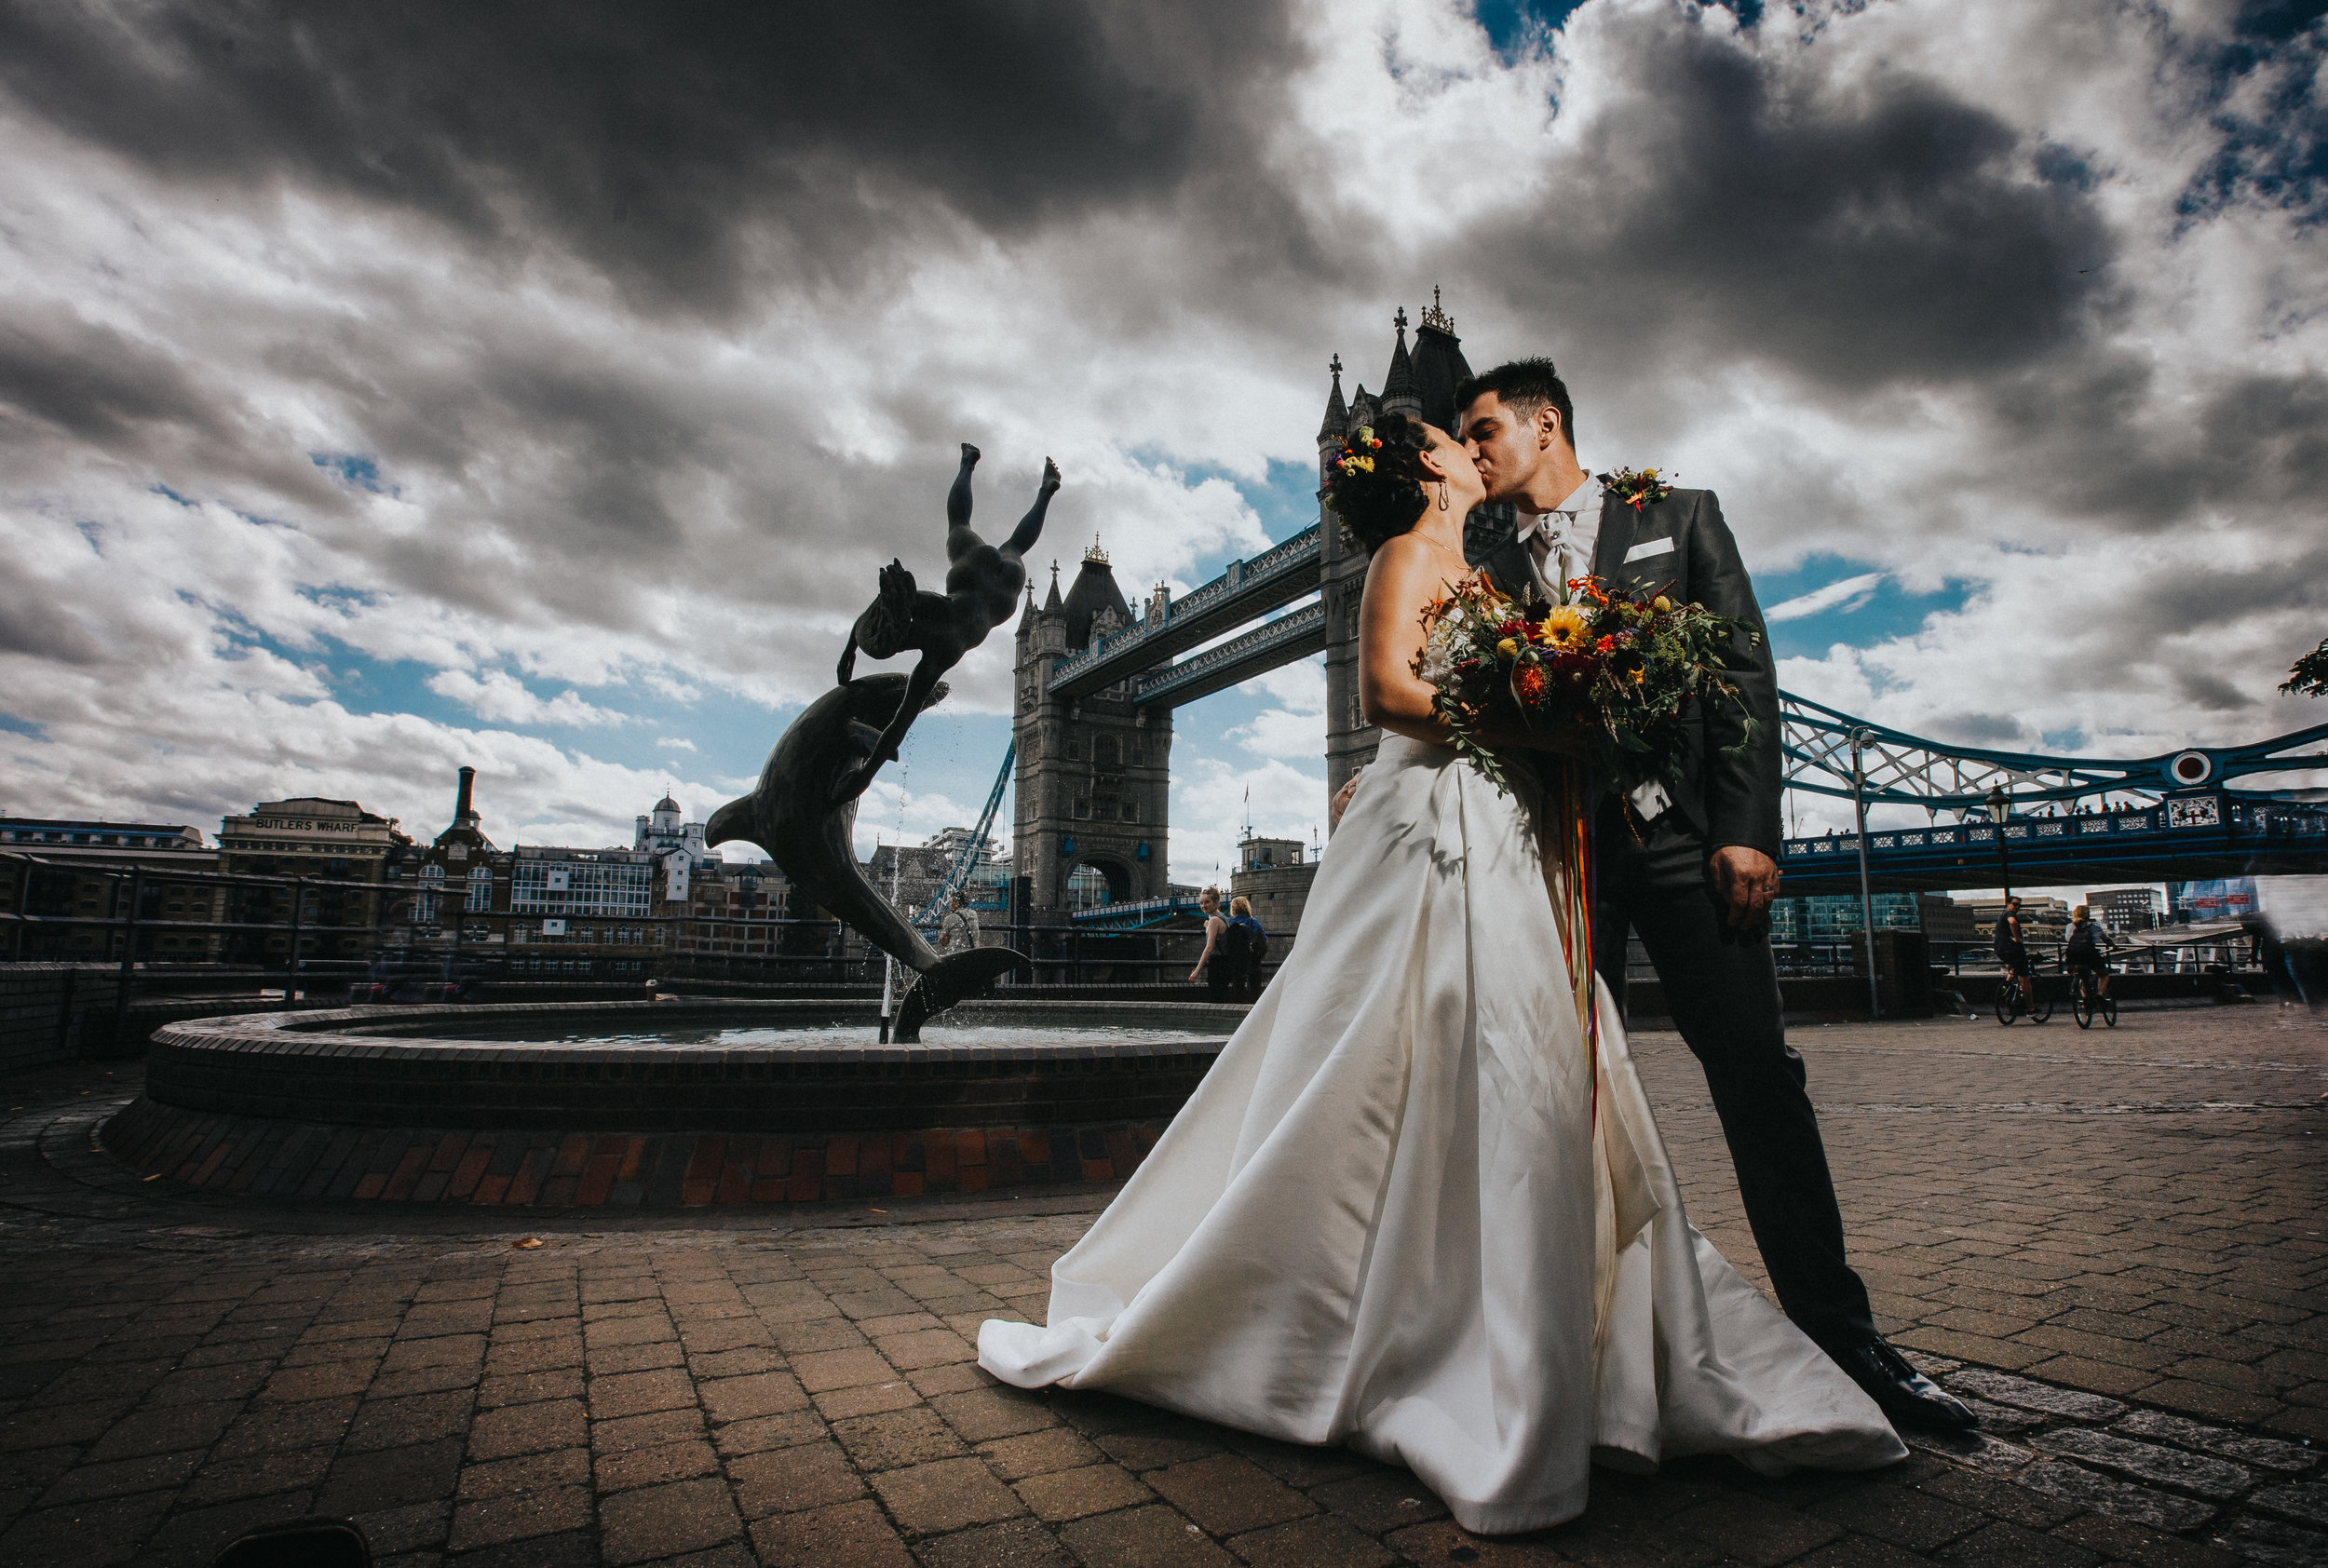 river-rooms-tower-bridge-london-stpauls-mondrian-hotel-wedding-photography-videography-54